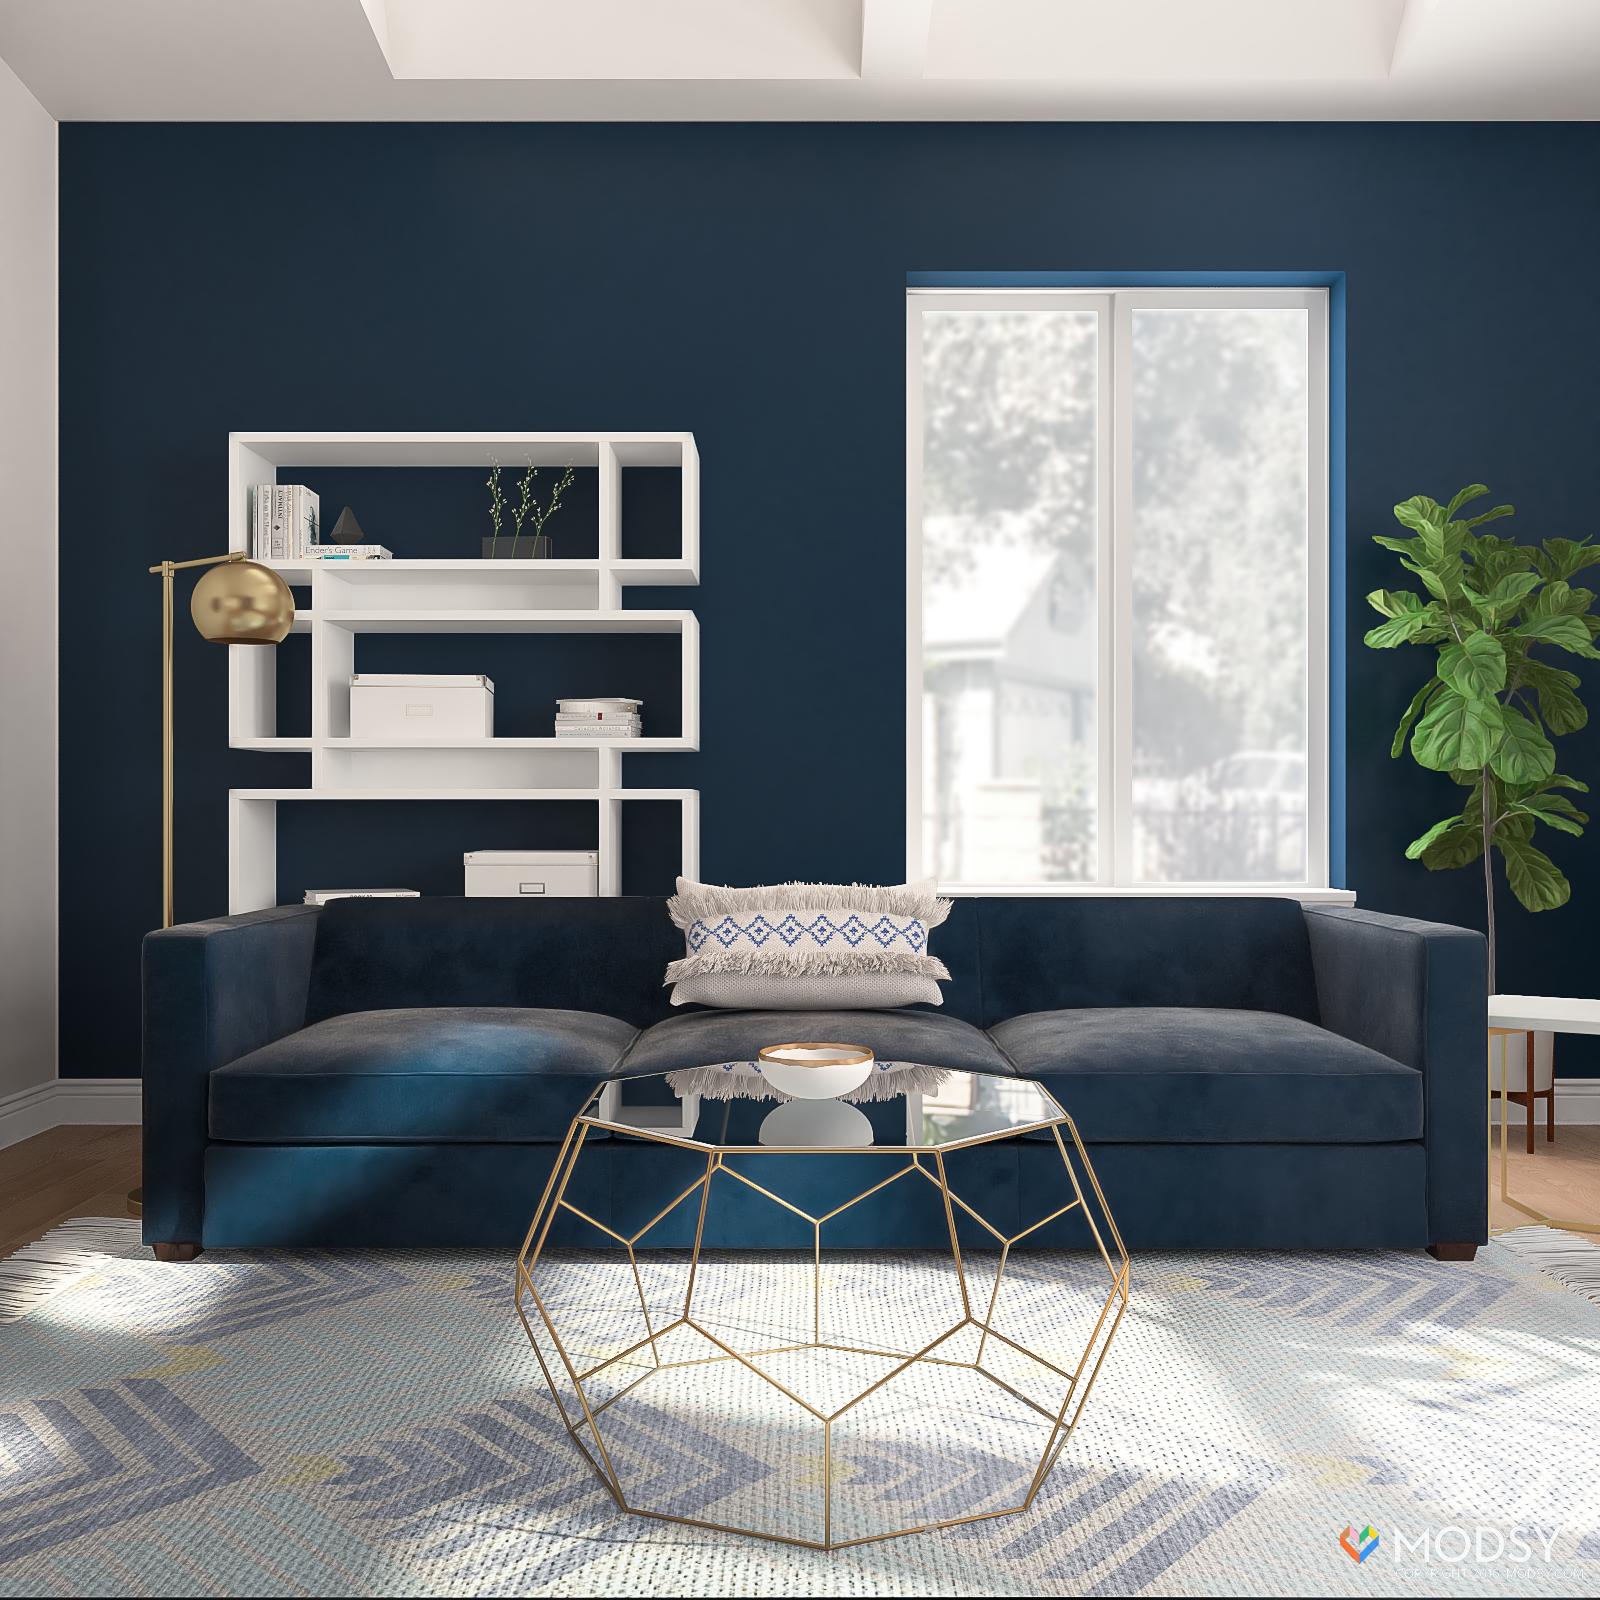 living room furniture budget%0A A Living Room Under Budget